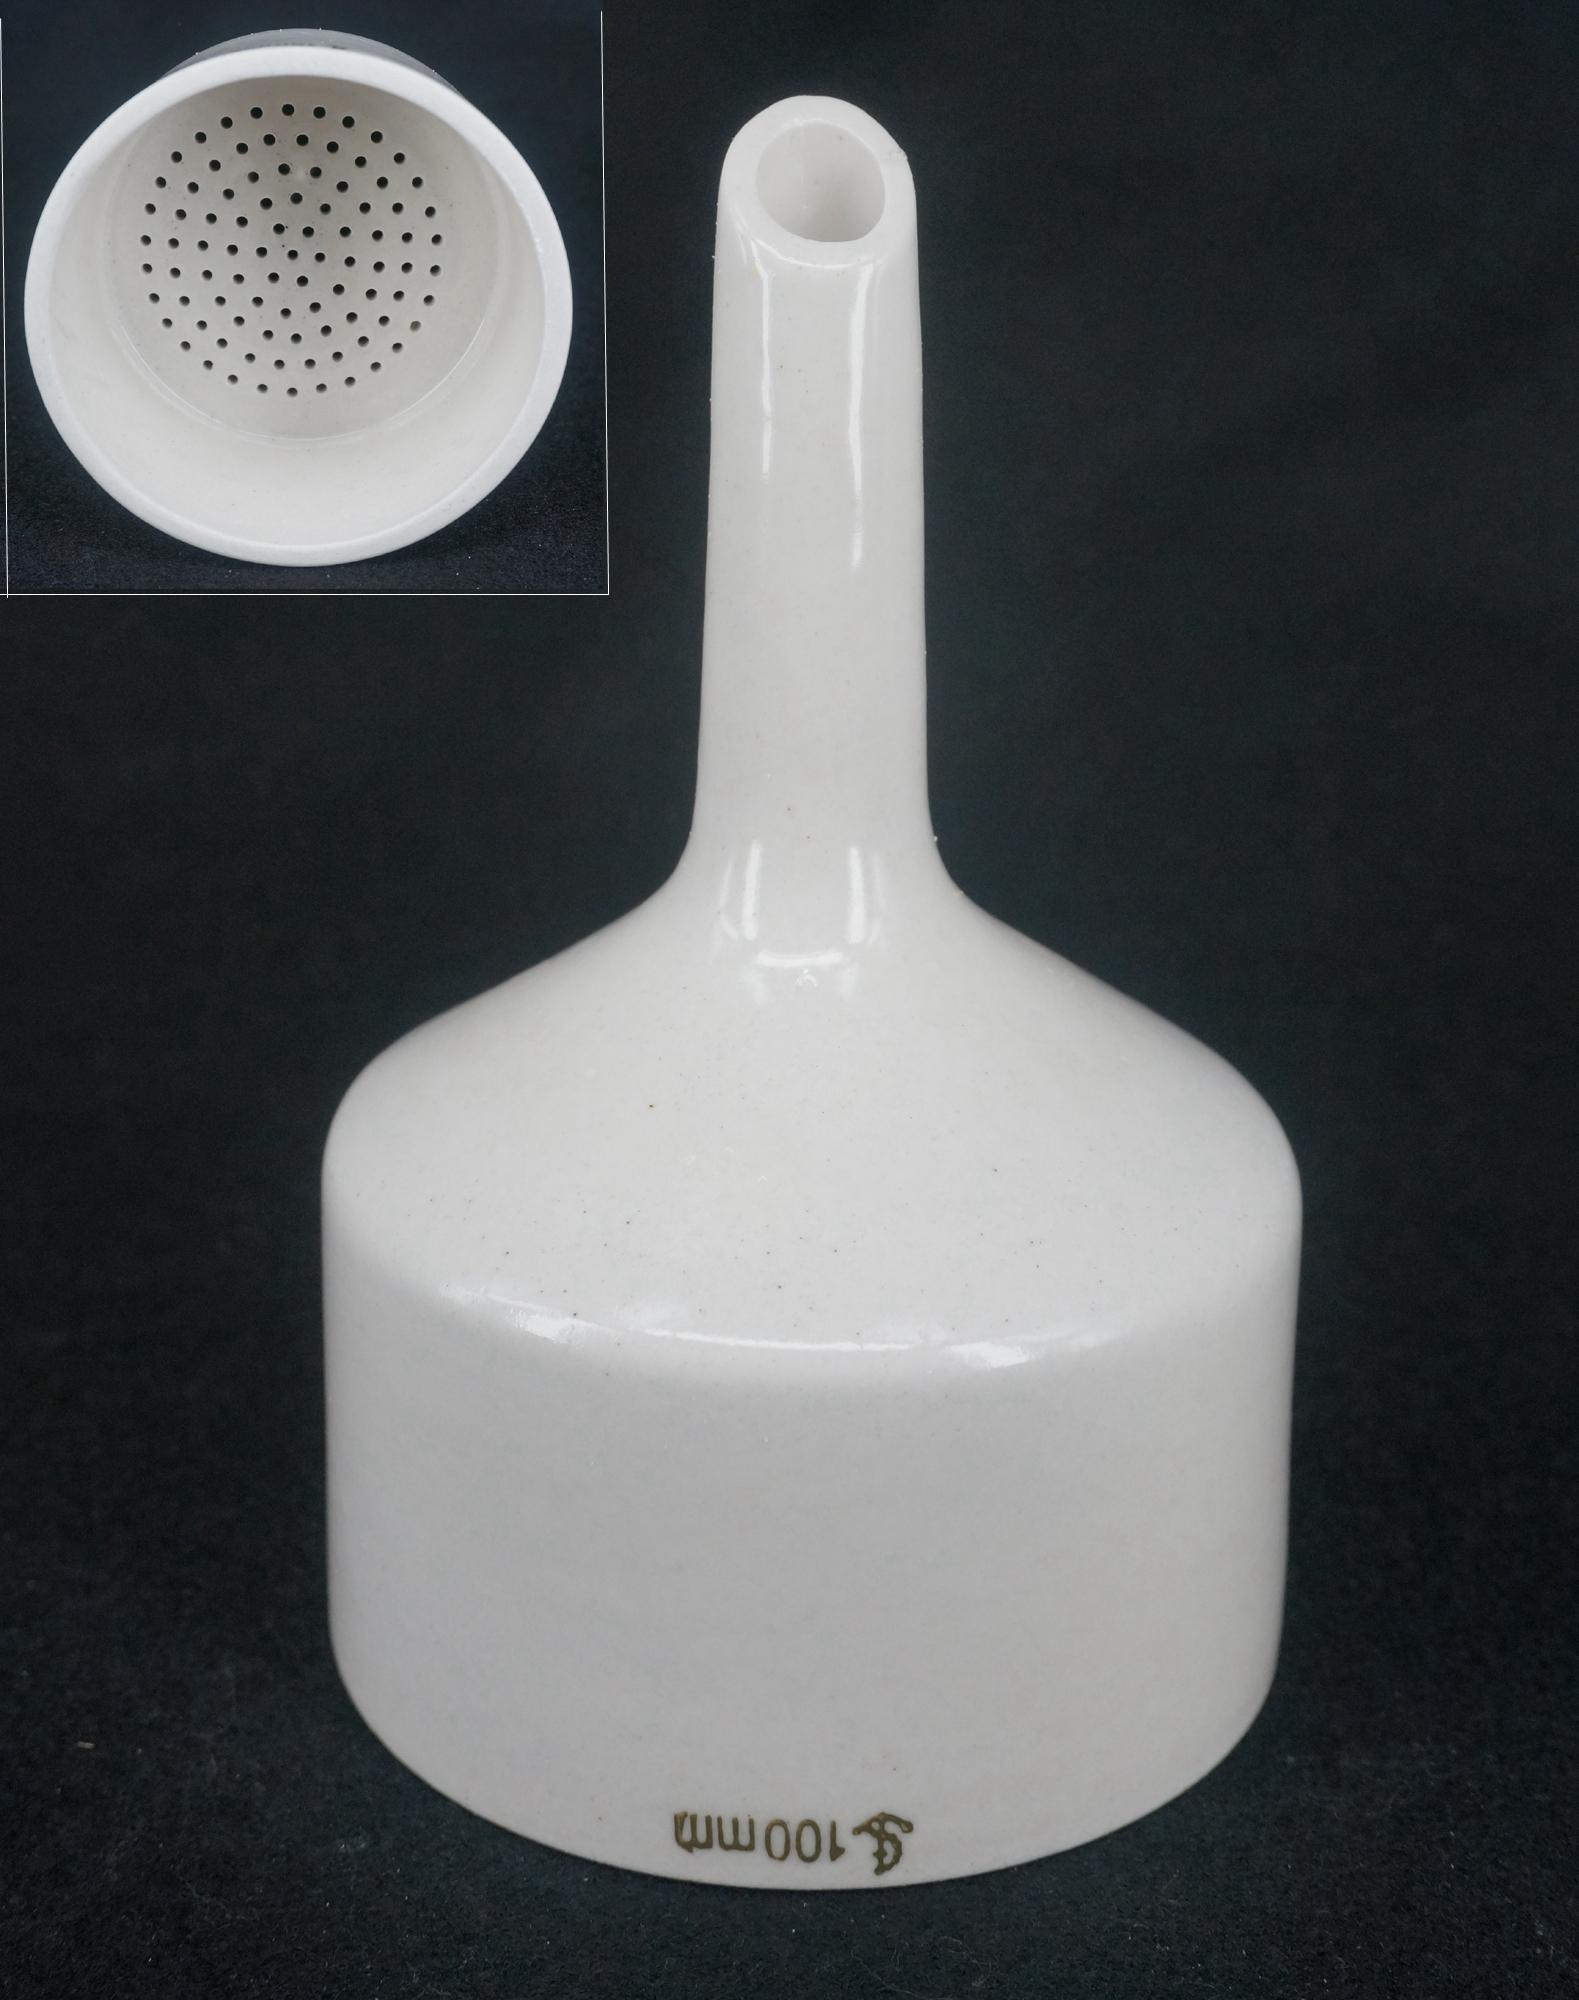 100mm Porcelain Buchner Funnel Chemistry Laboratory Filtration Filter Kit Tools Porous Funnel